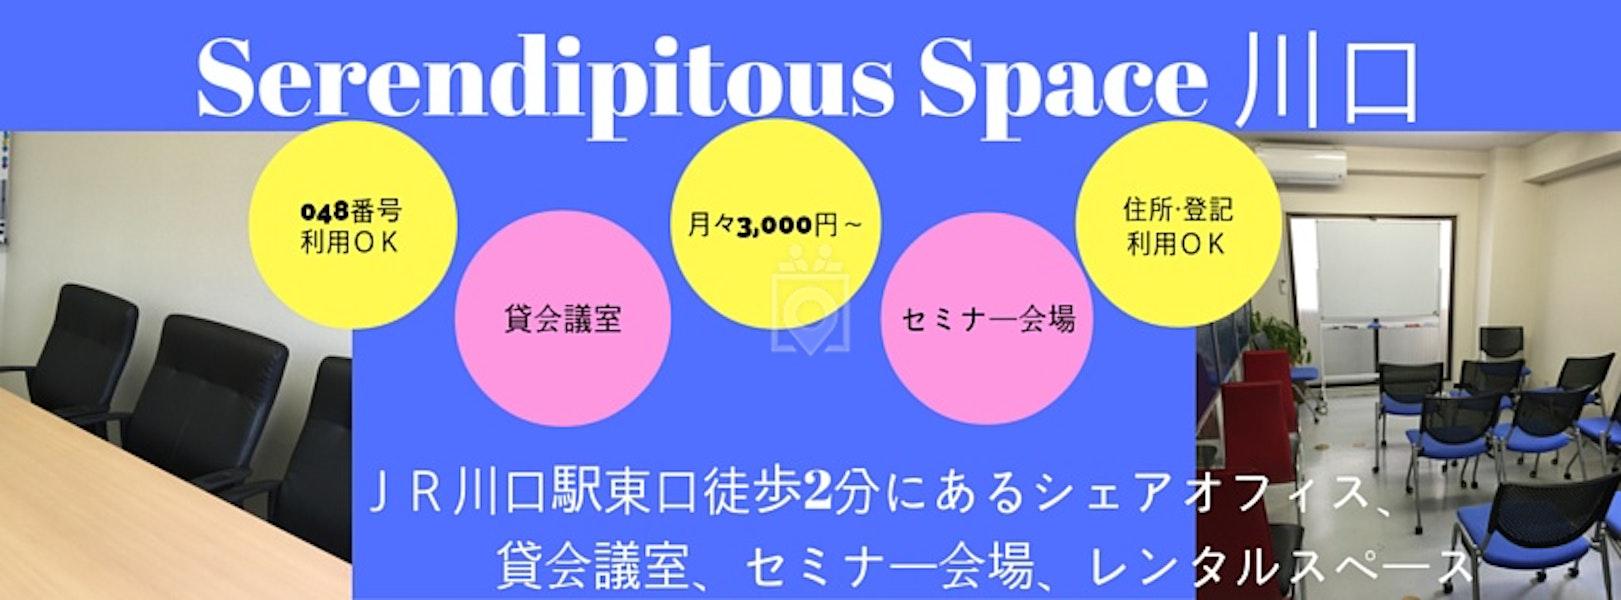 Serendipitous Space, Kawaguchi